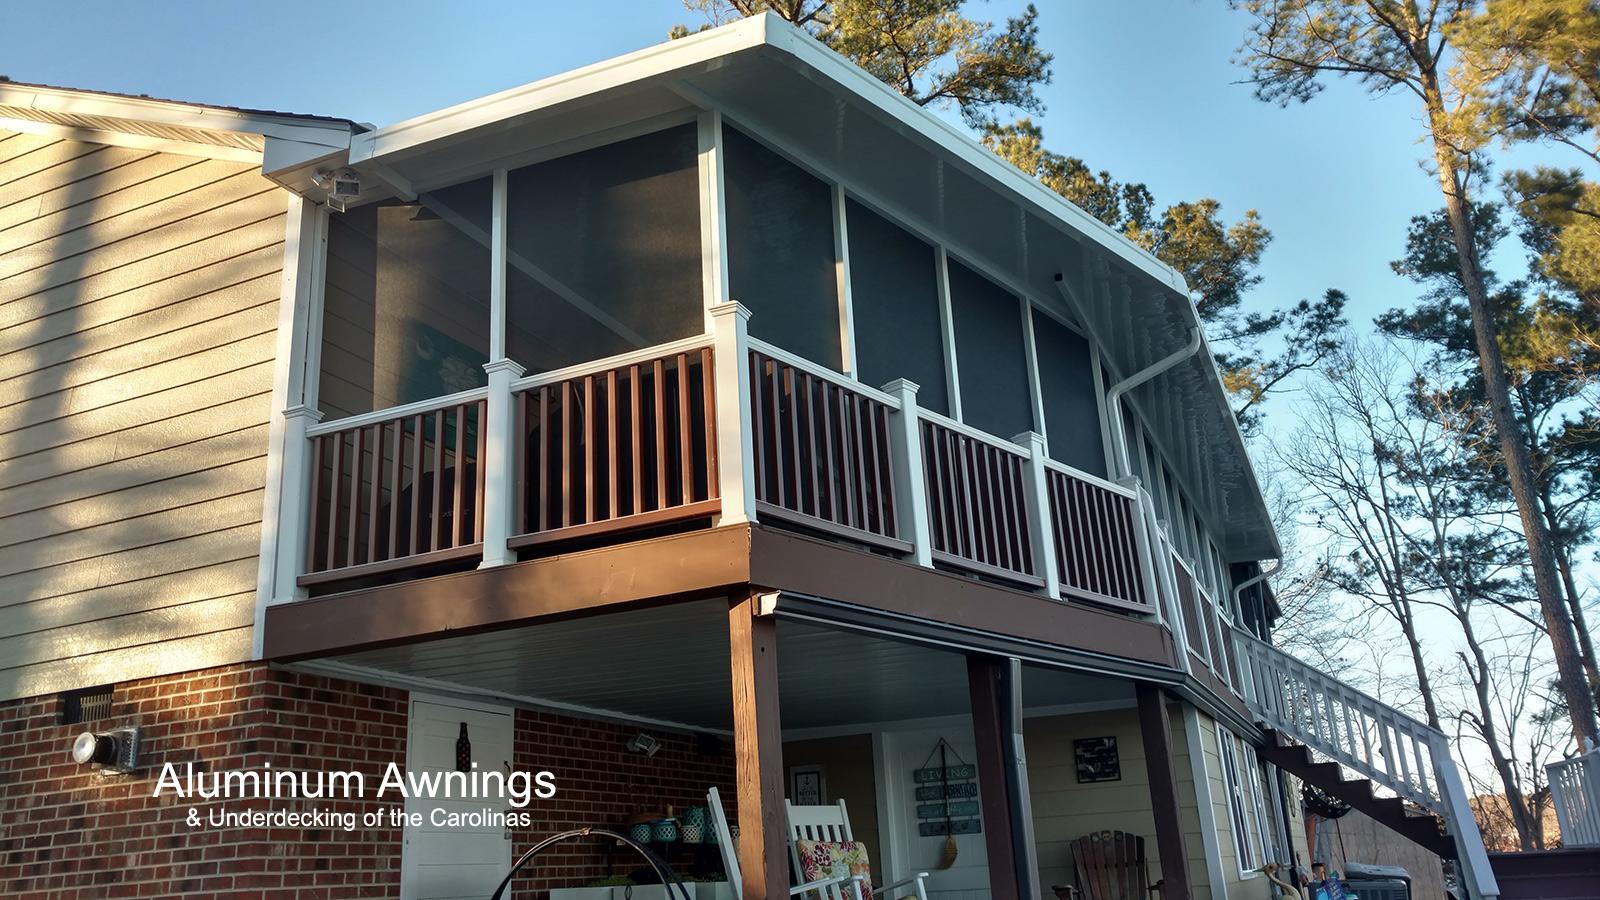 Under Decking Installation – Aluminum Awnings ...